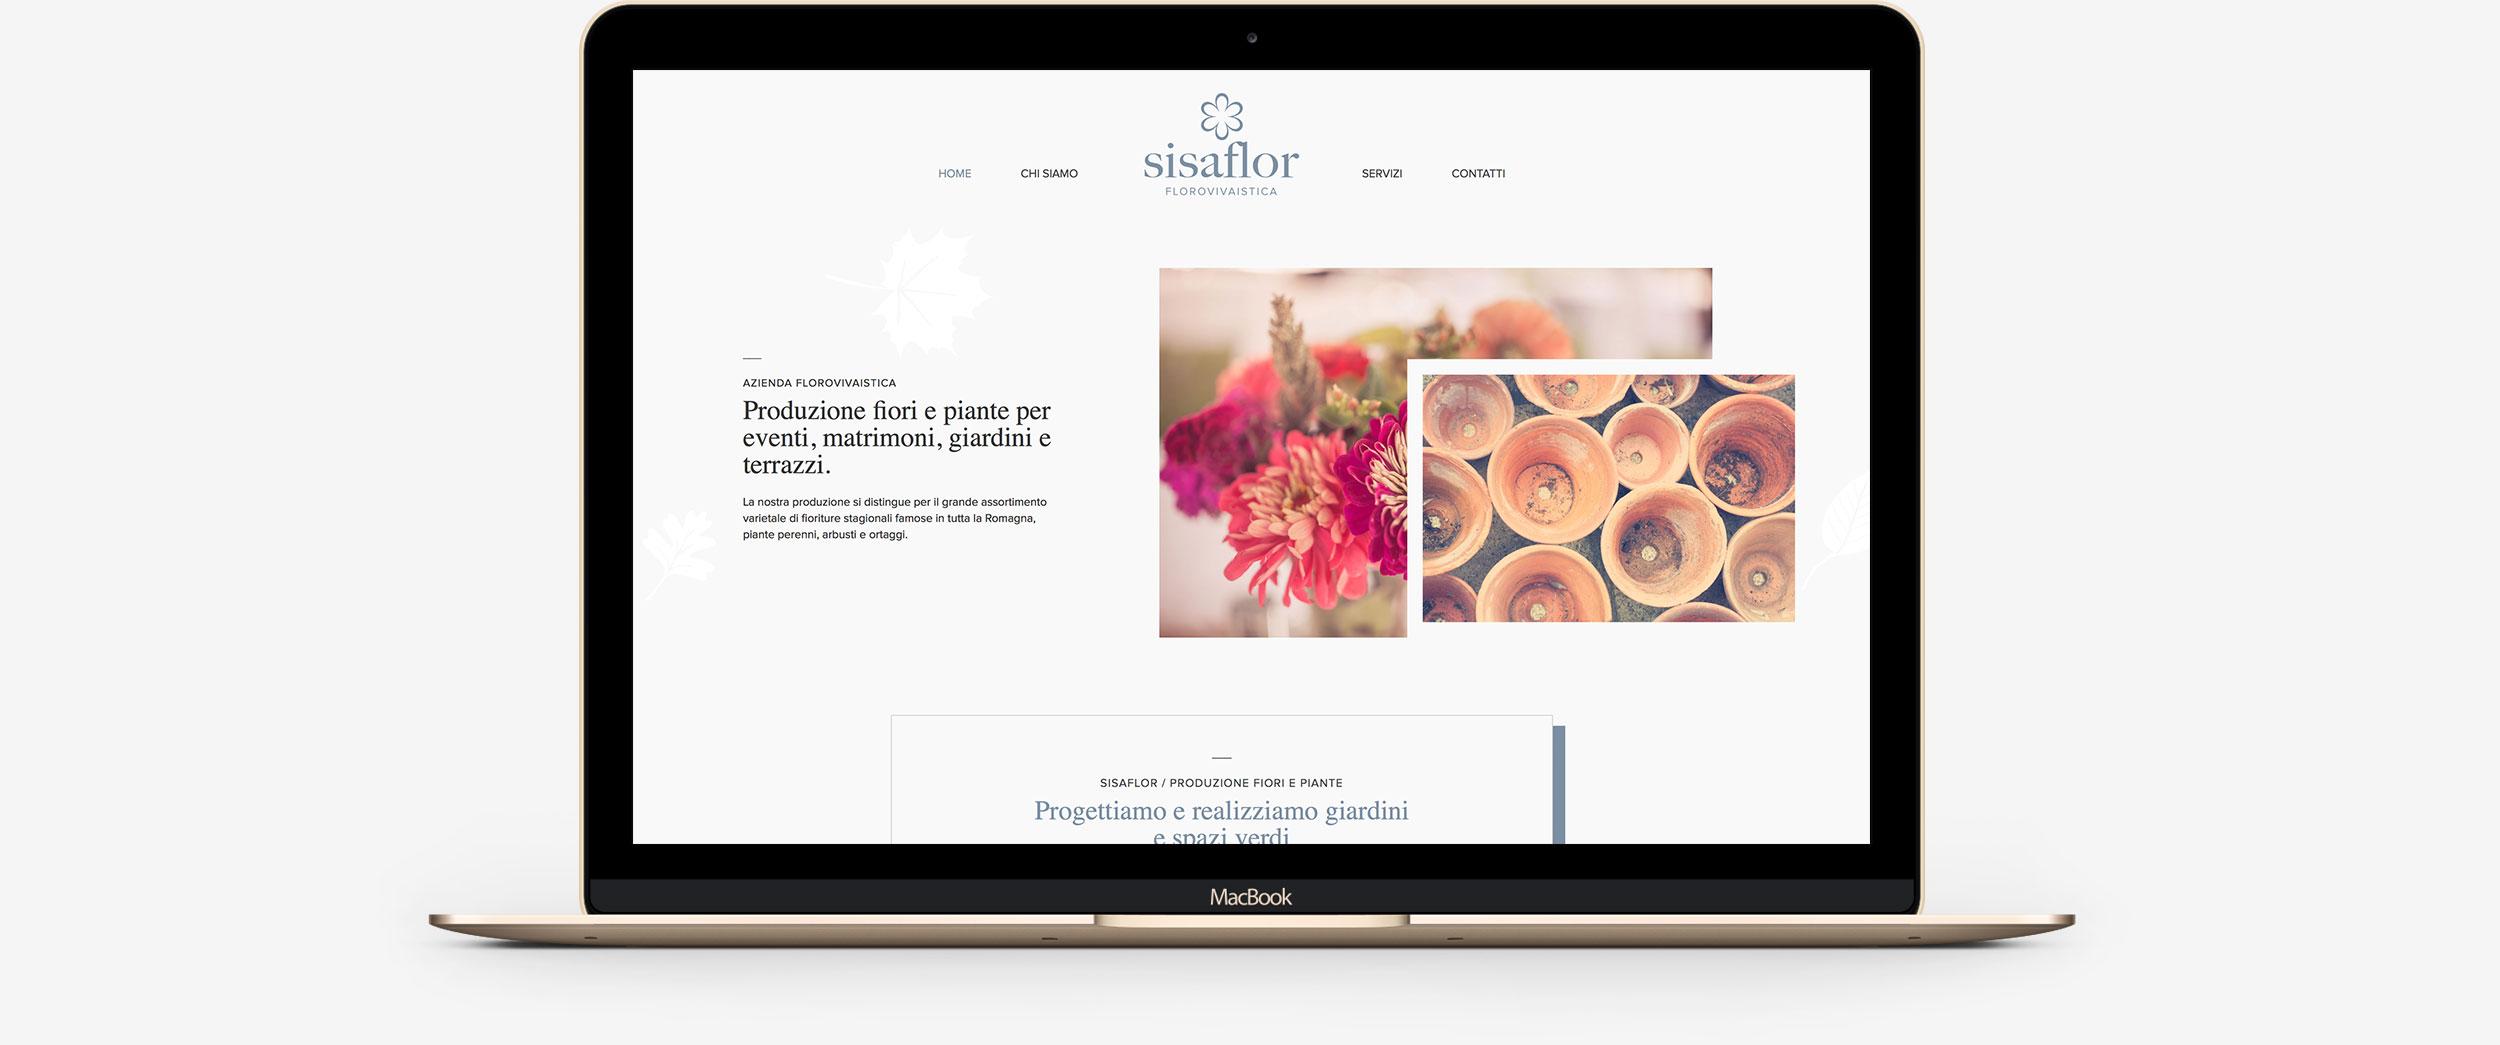 Sisaflor Macbook